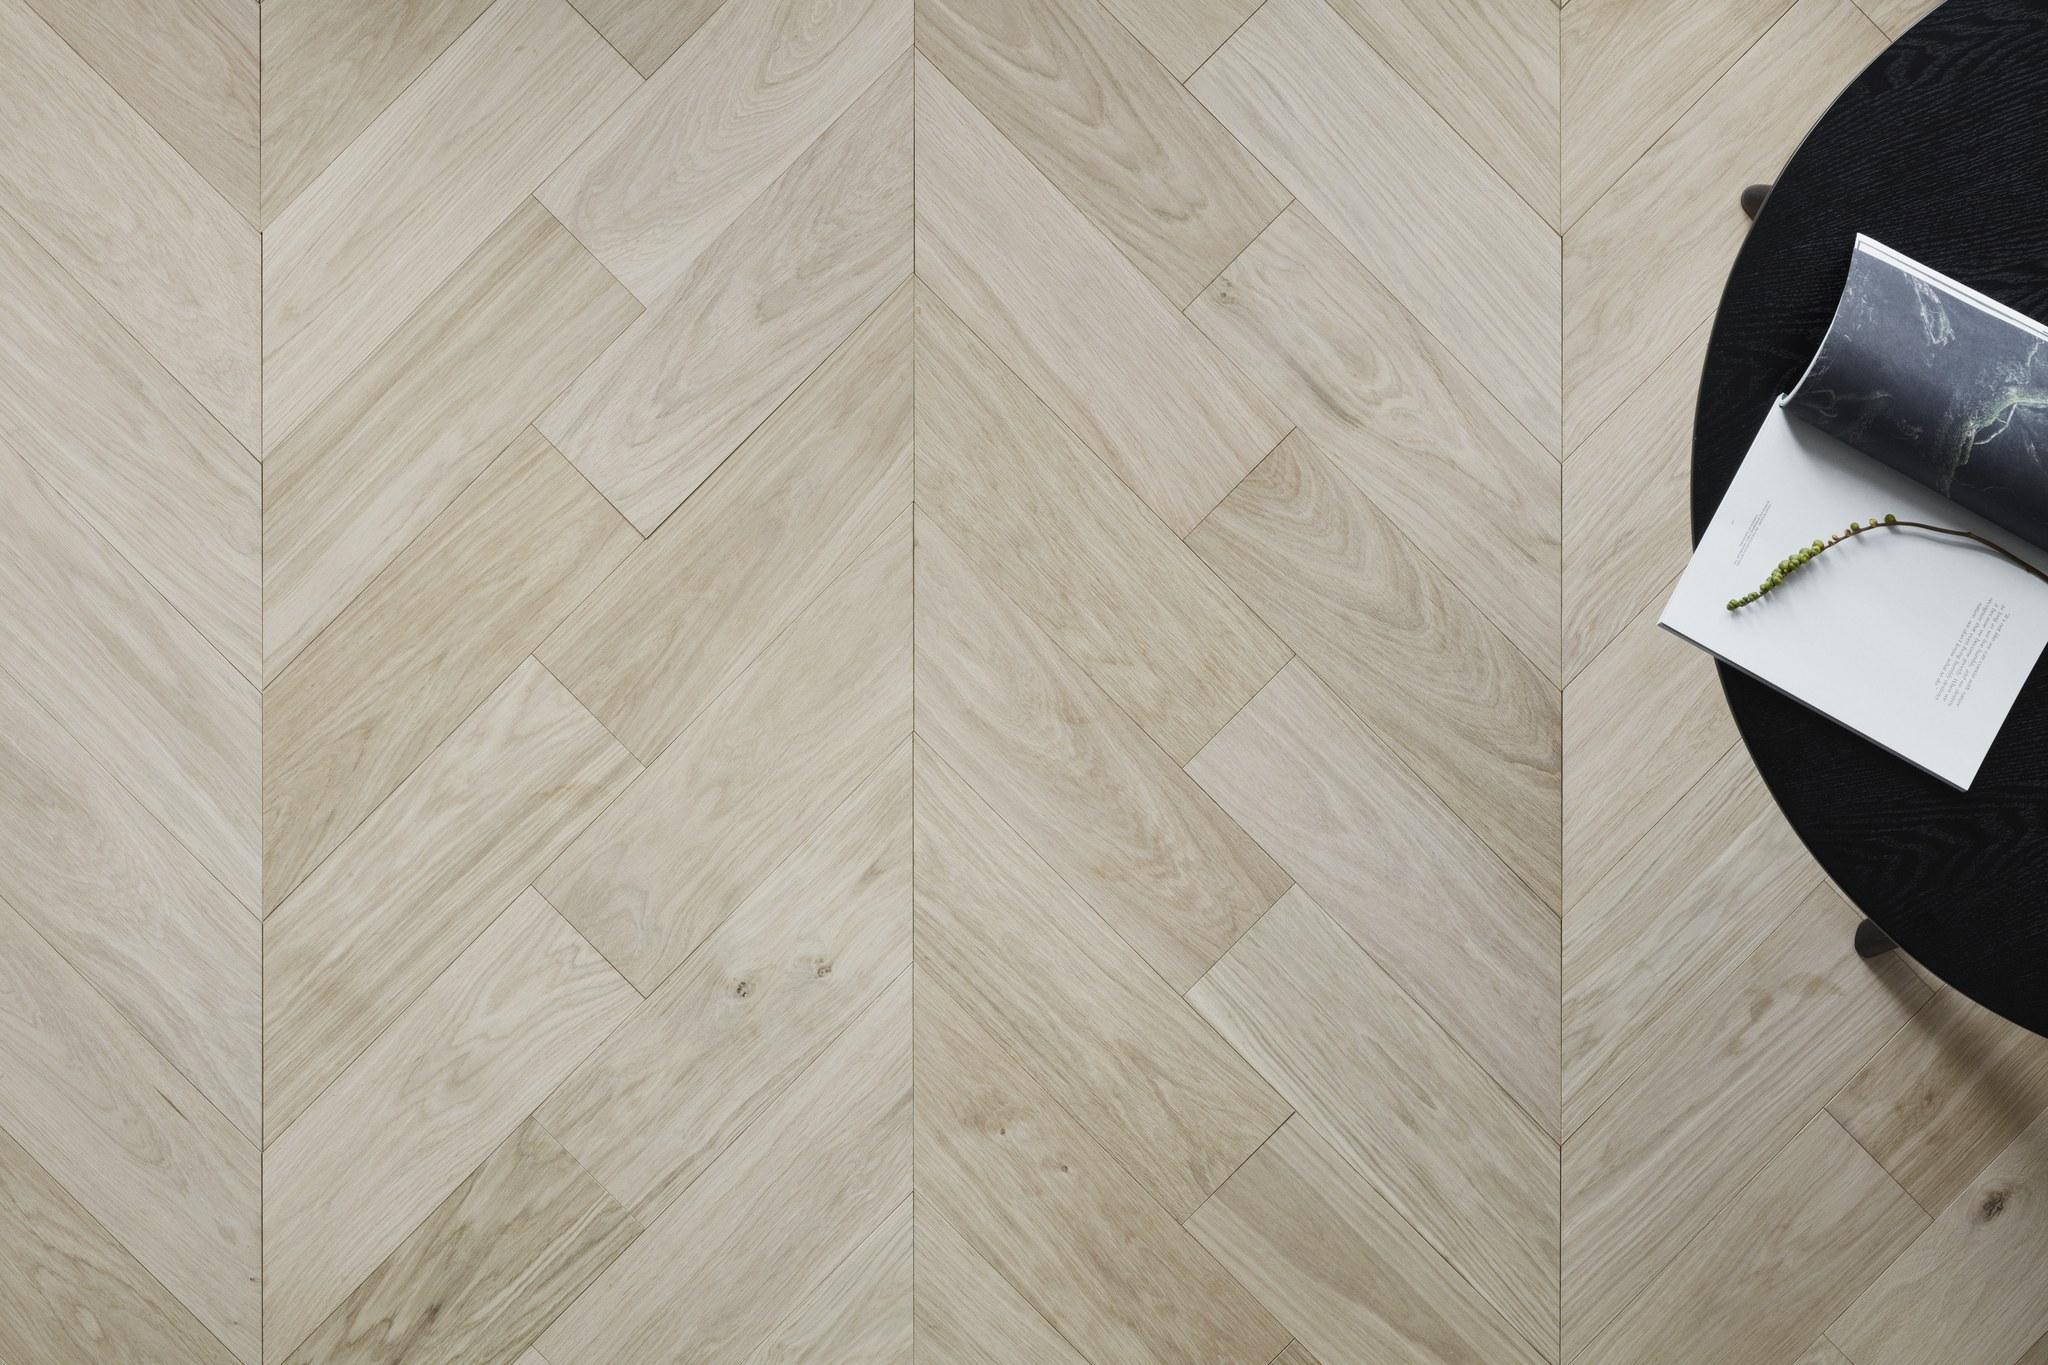 Timberwise Tammi Oak Design Floor Pala Chevron Lahikuva